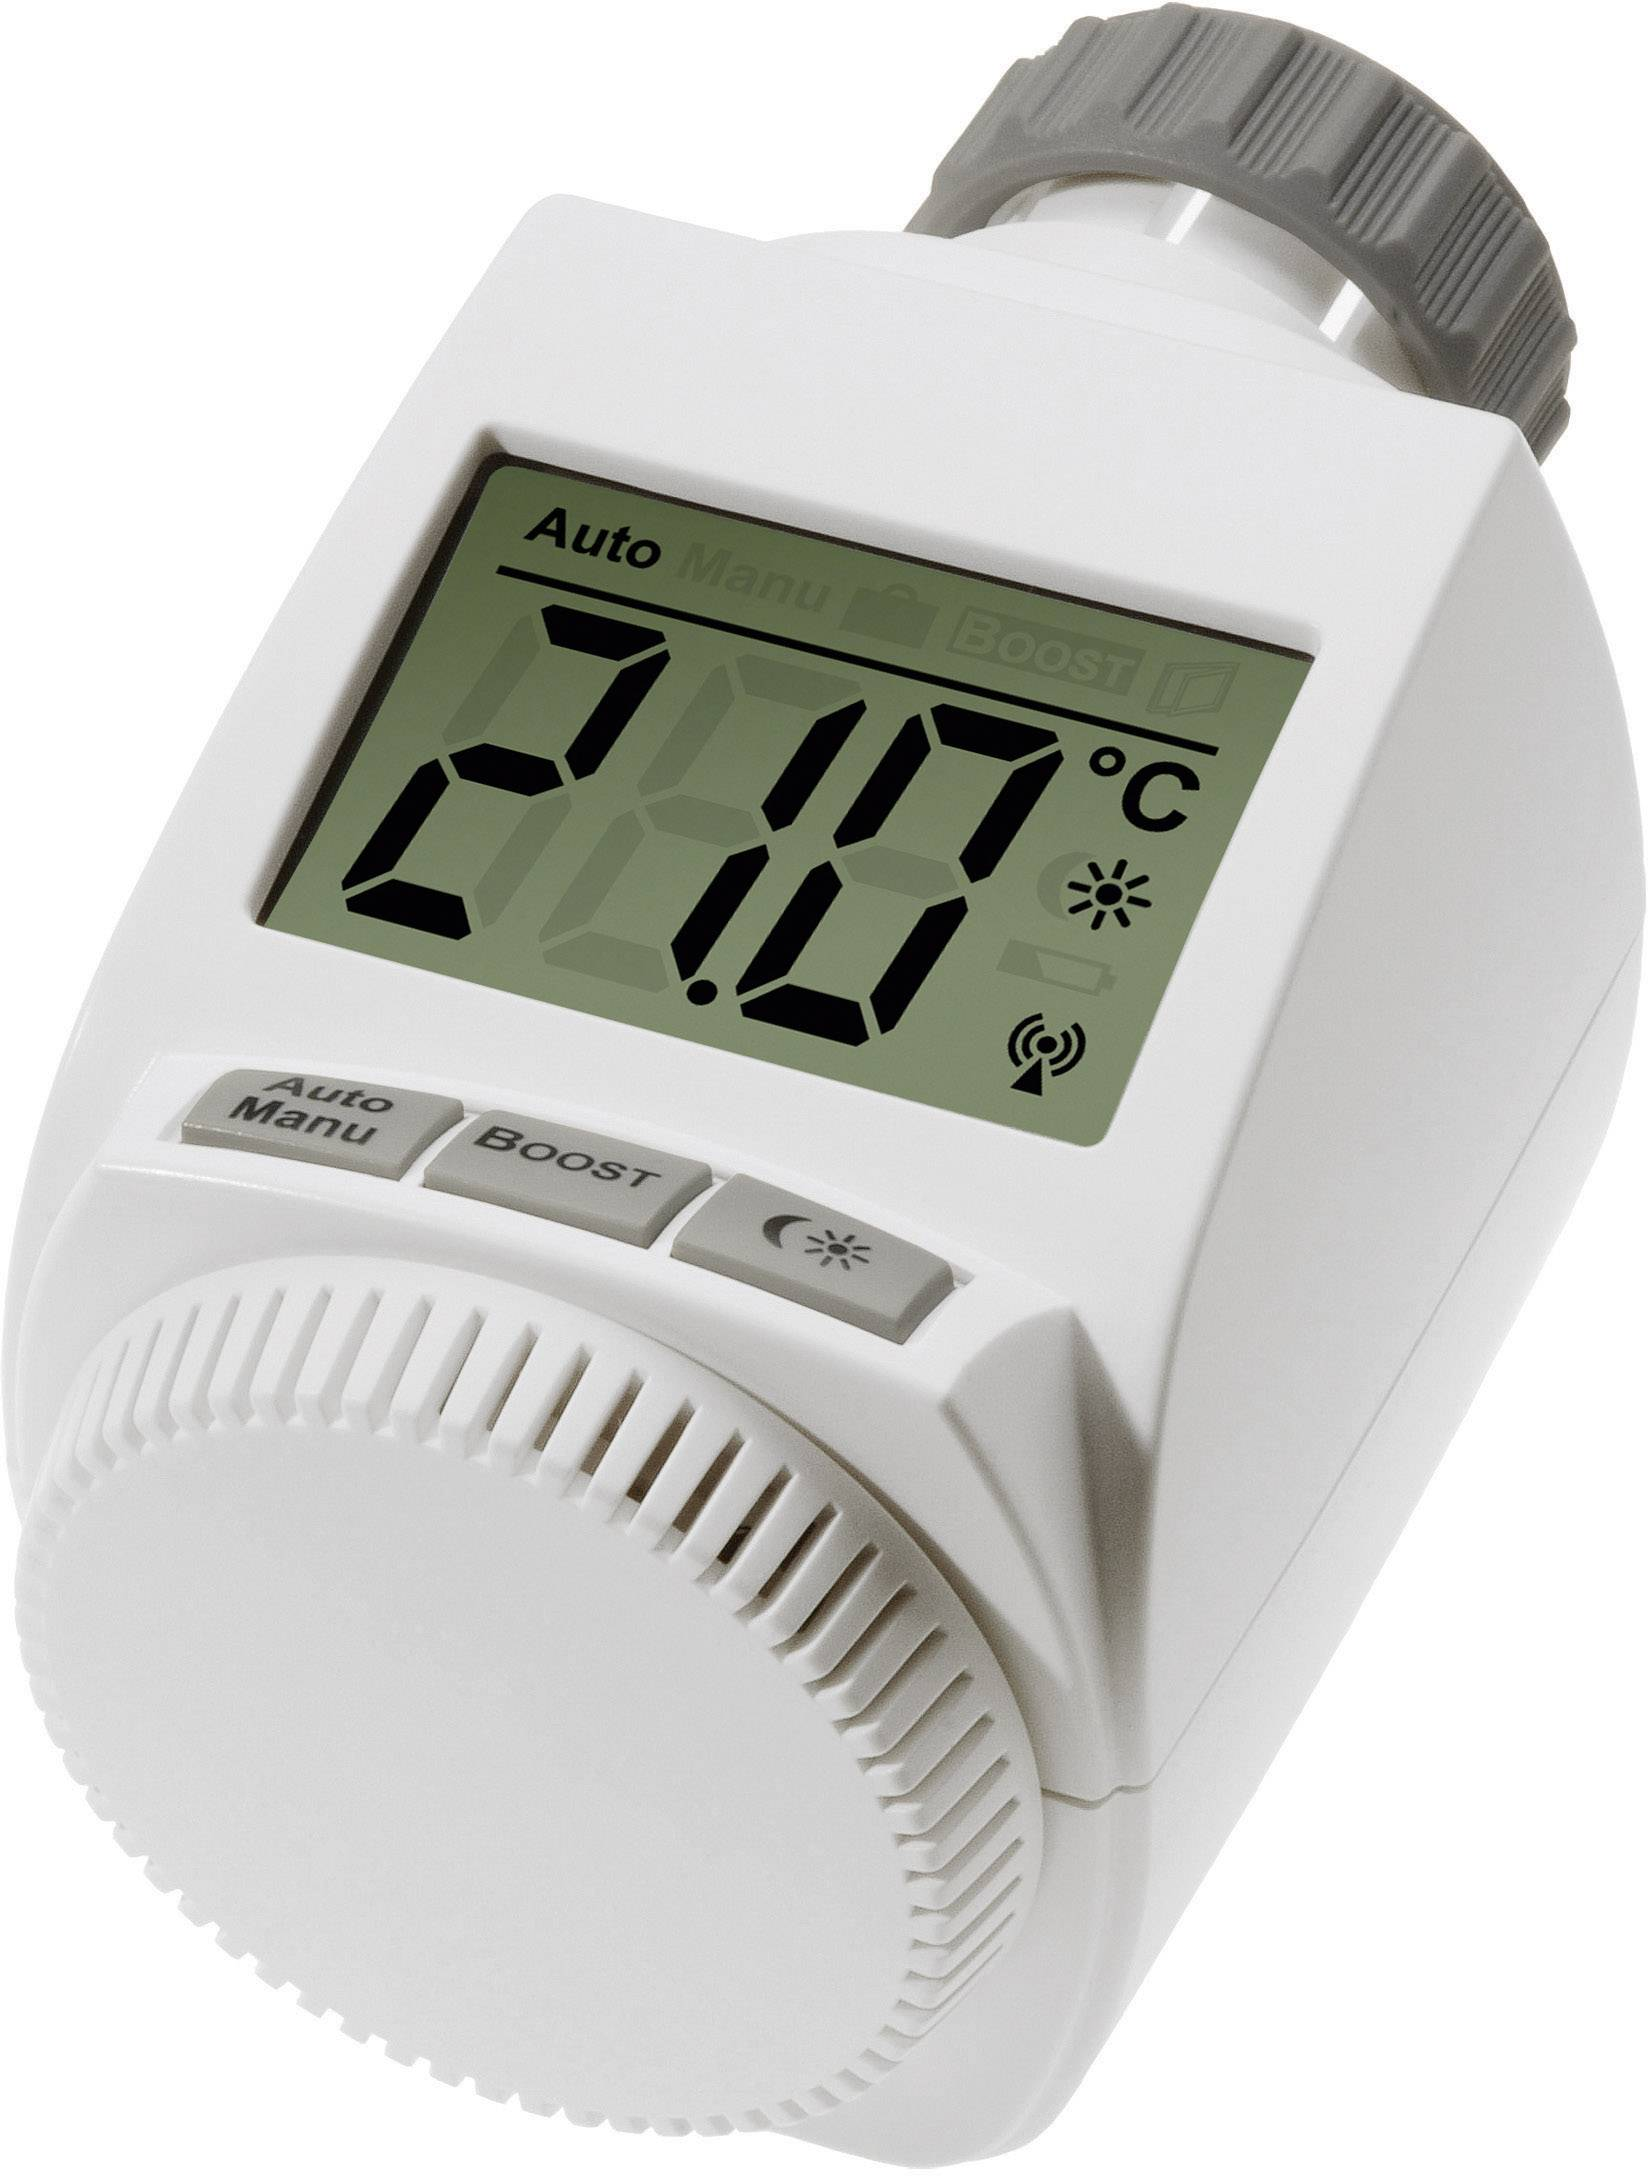 Ansluta Honeywell termostat